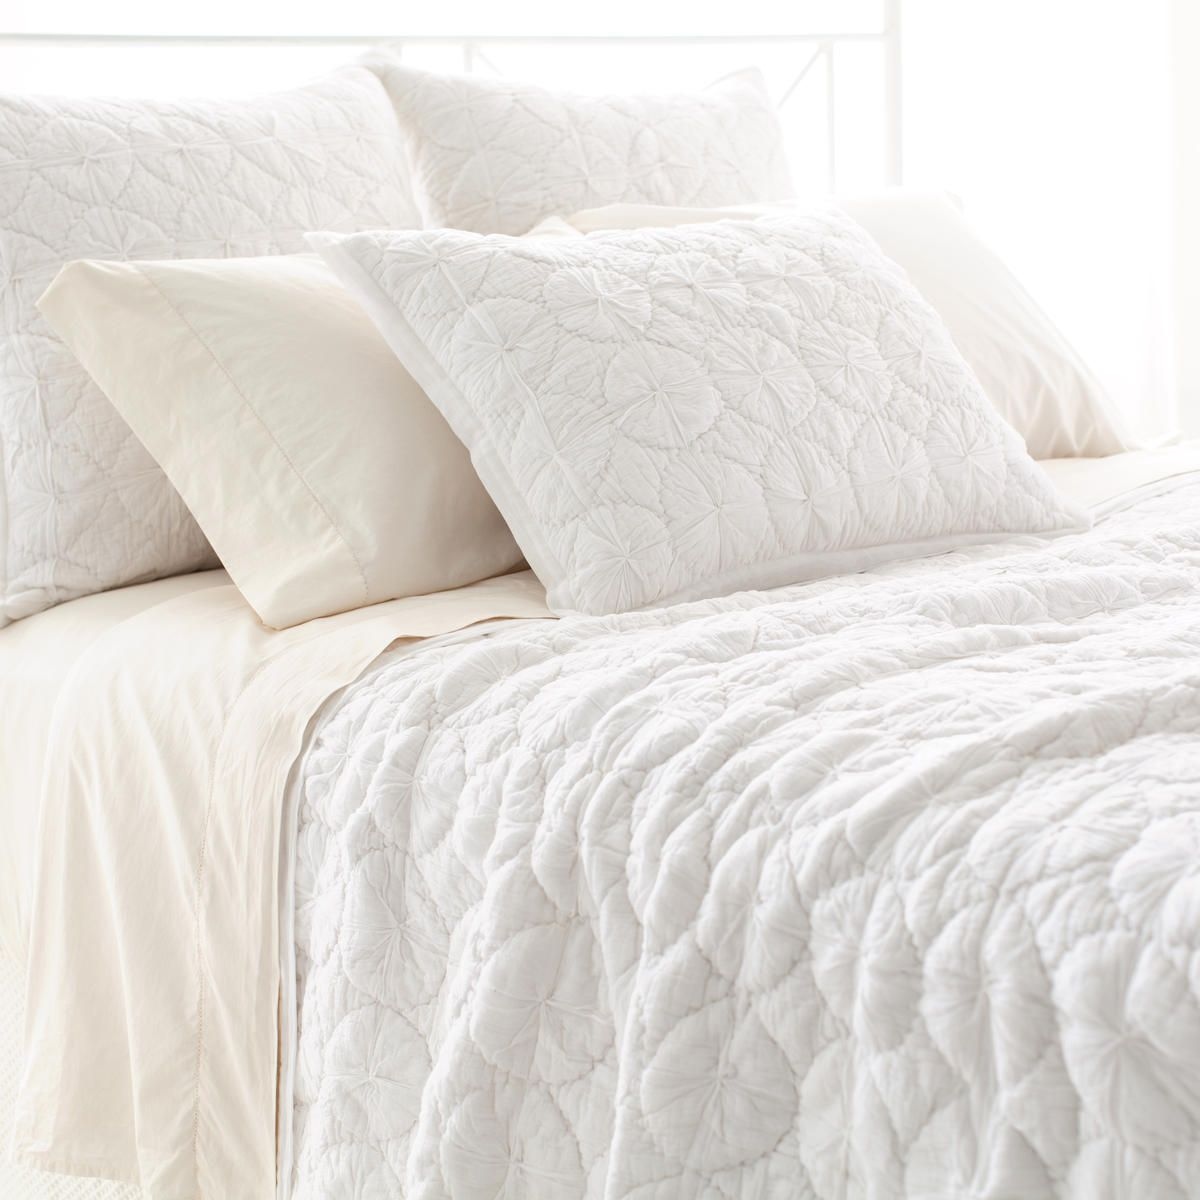 Marina White Quilt Pine Cone Hill Bedding Sets White Pillows